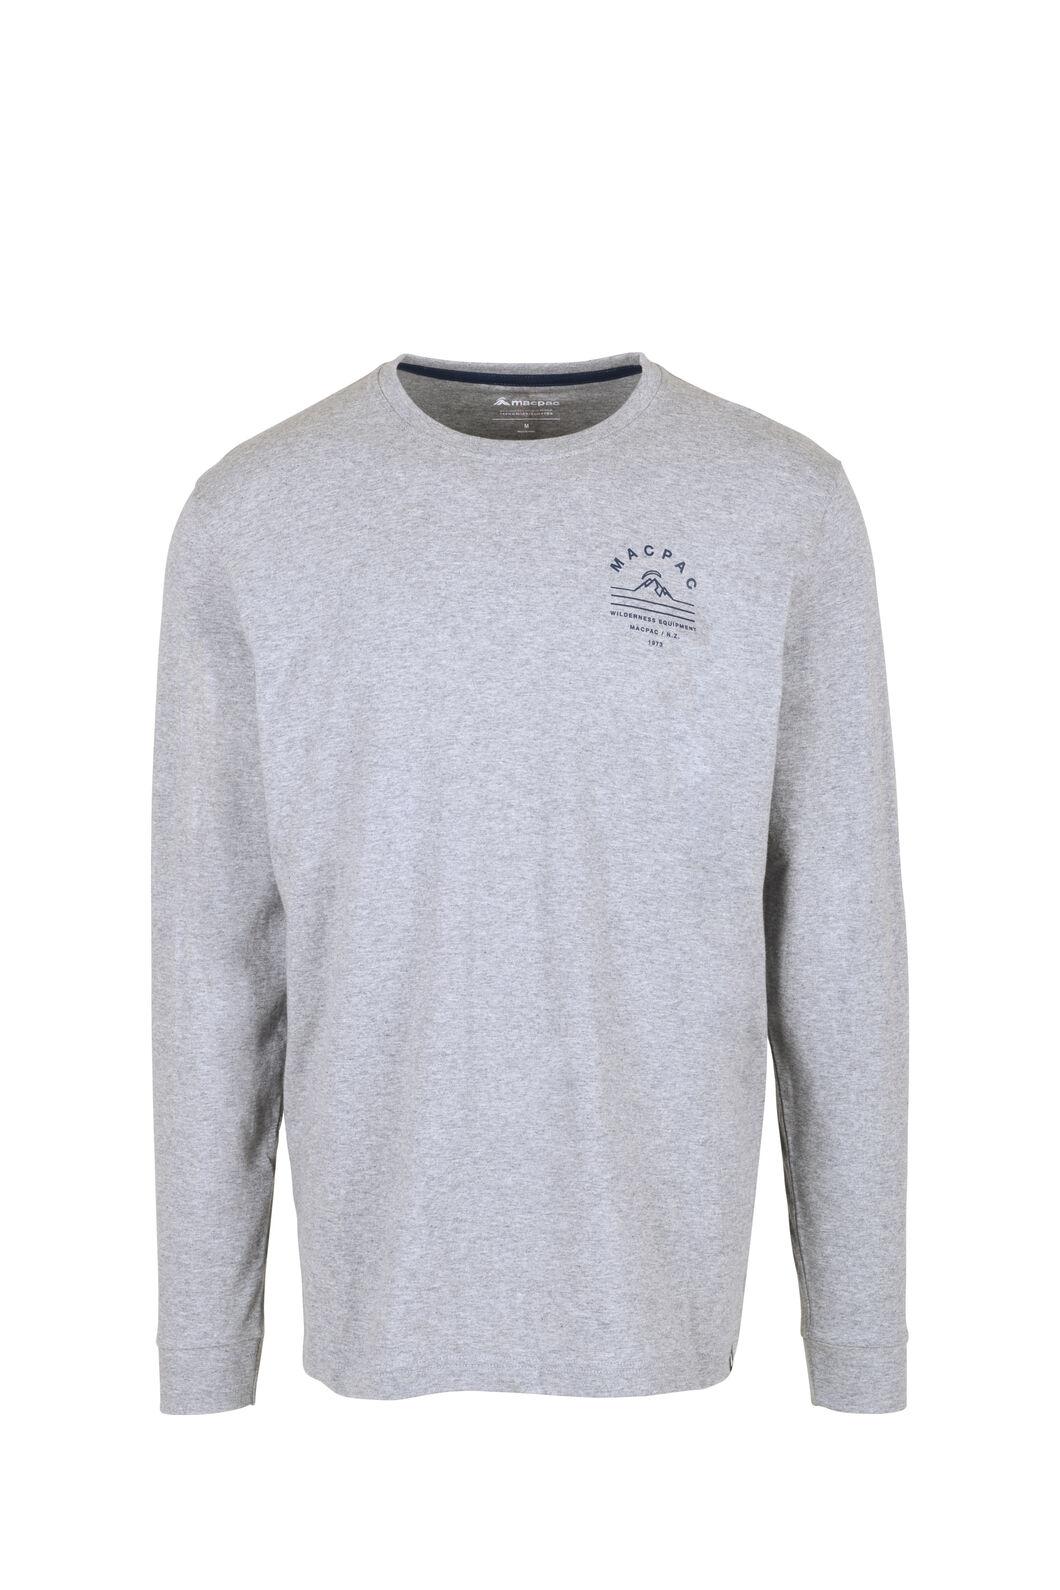 Macpac Alps Fairtrade Organic Cotton Long Sleeve Tee — Men's, Grey Marle/Mood Indigo, hi-res